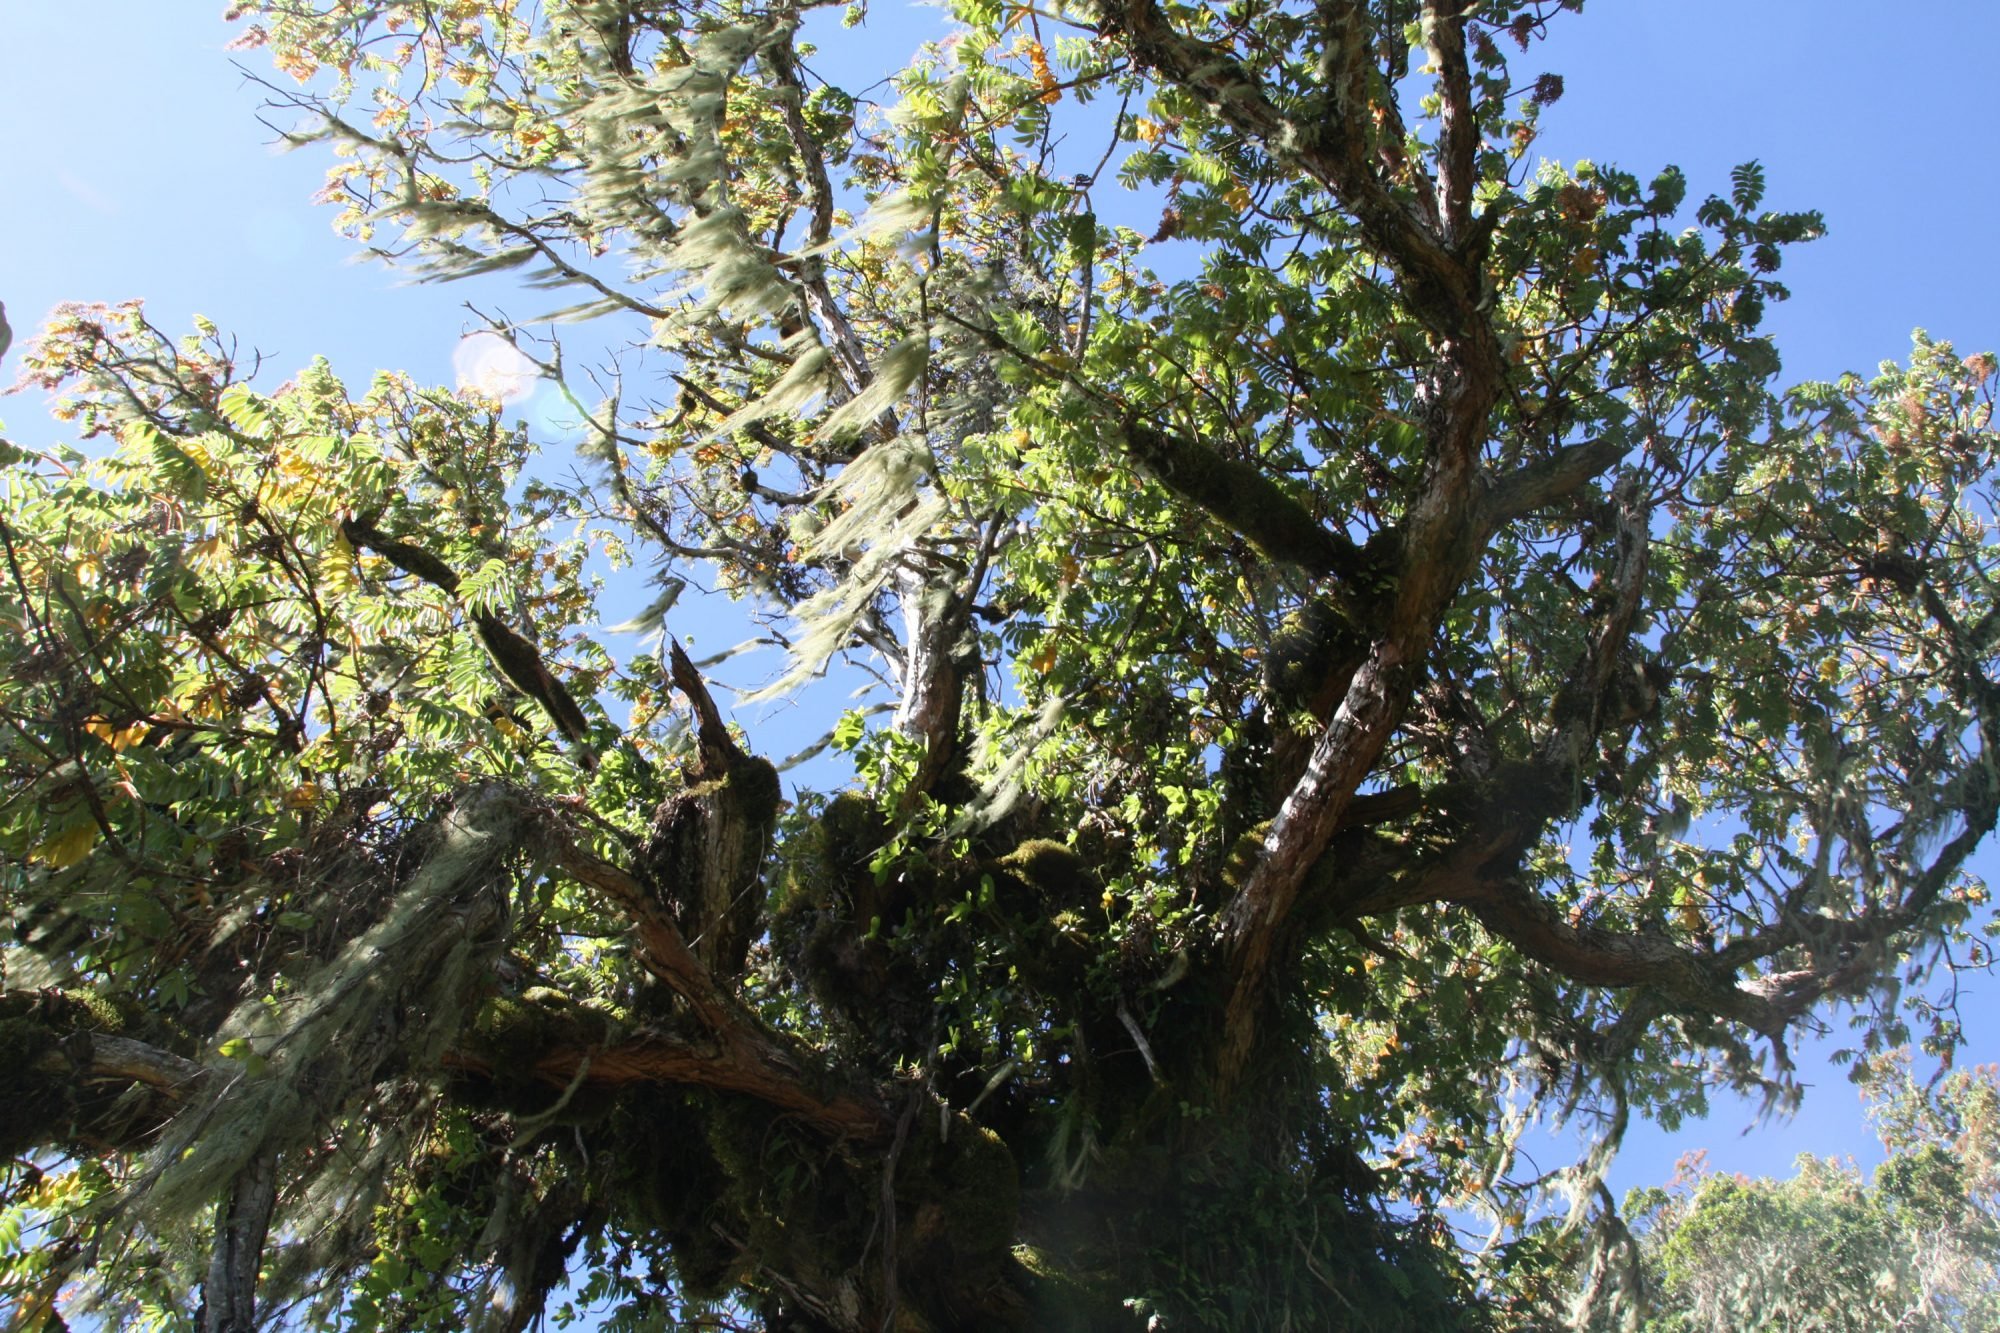 Regenwald am Mount Meru, Regenwald, Arusha Nationalpark, Tansania, Afrika